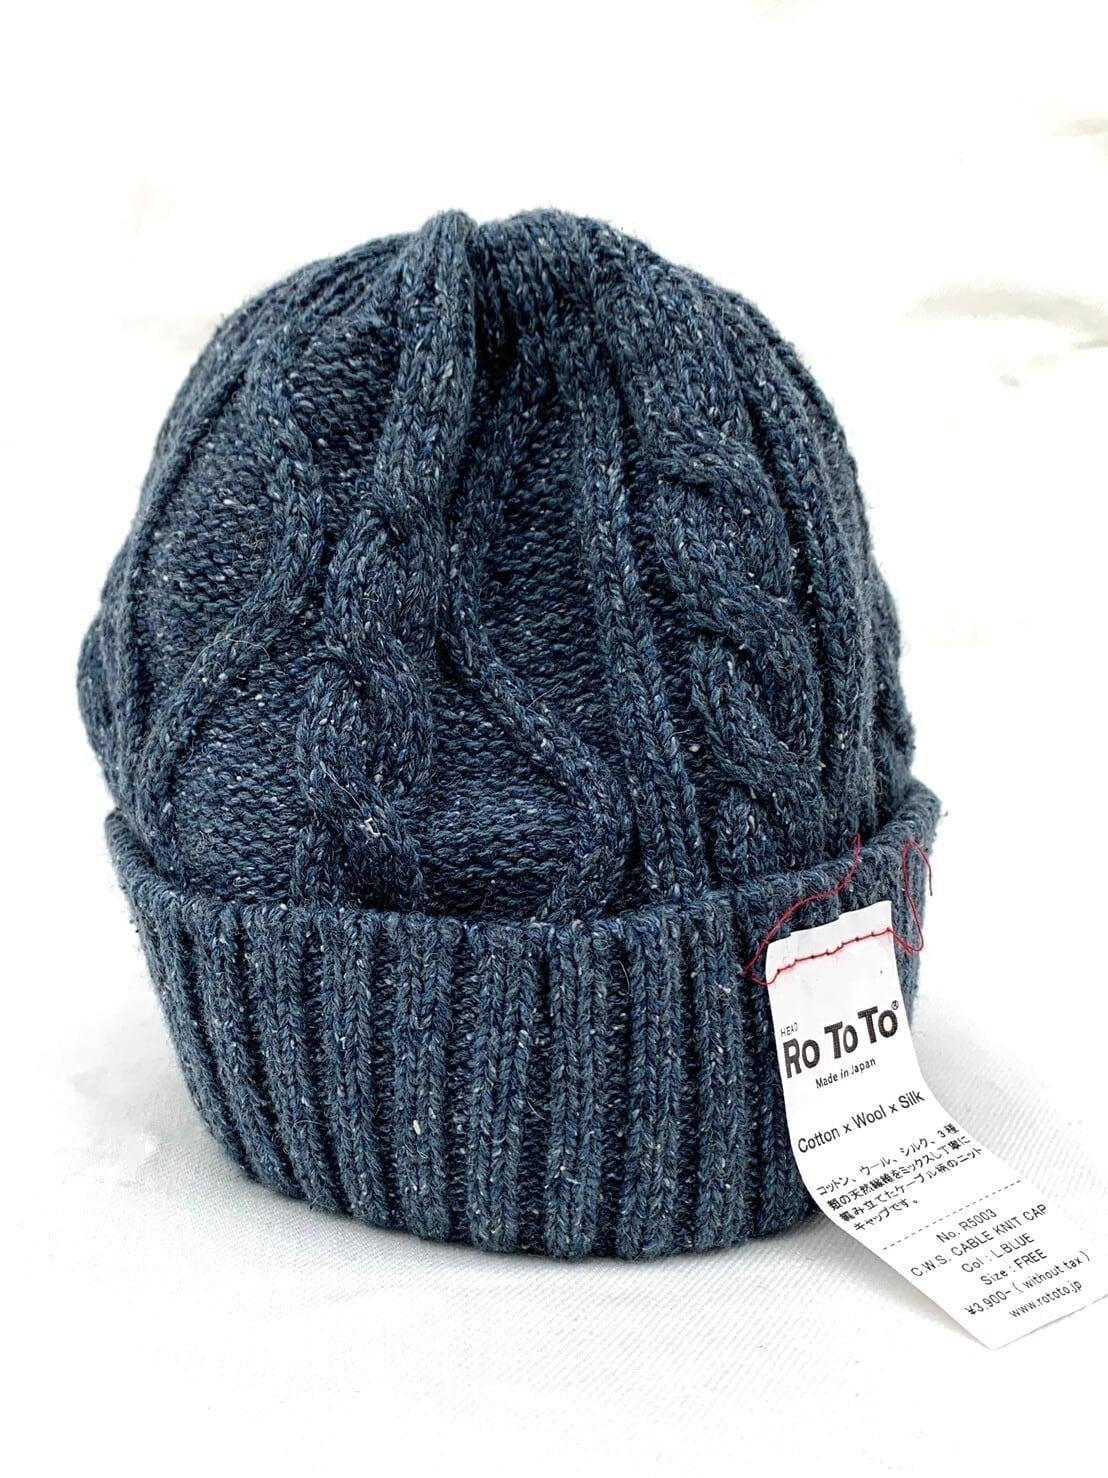 【ROTOTO】C.W.S CABLEKNIT CAP